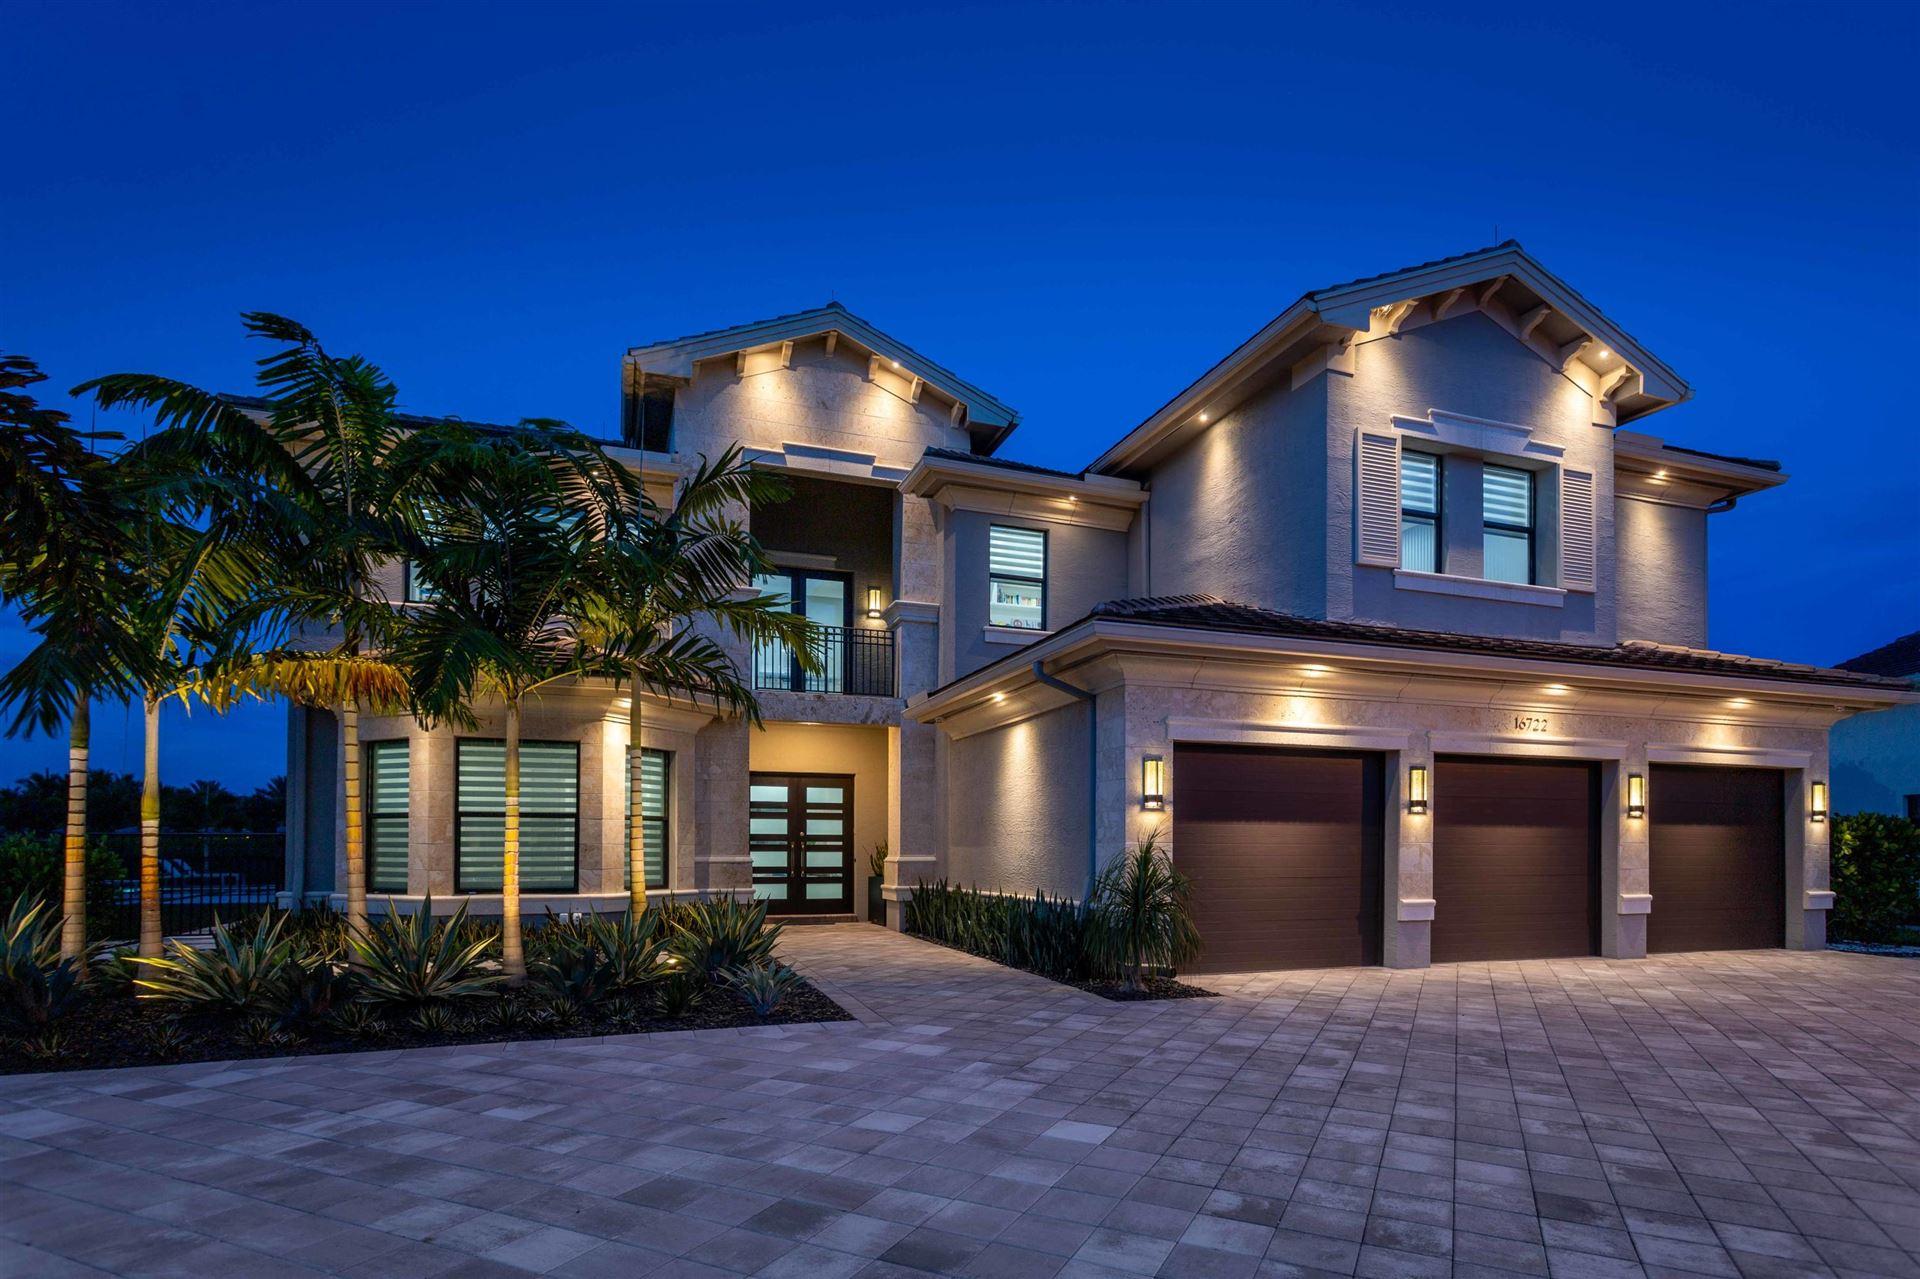 16722 Cannes Street, Delray Beach, FL 33446 - #: RX-10646978